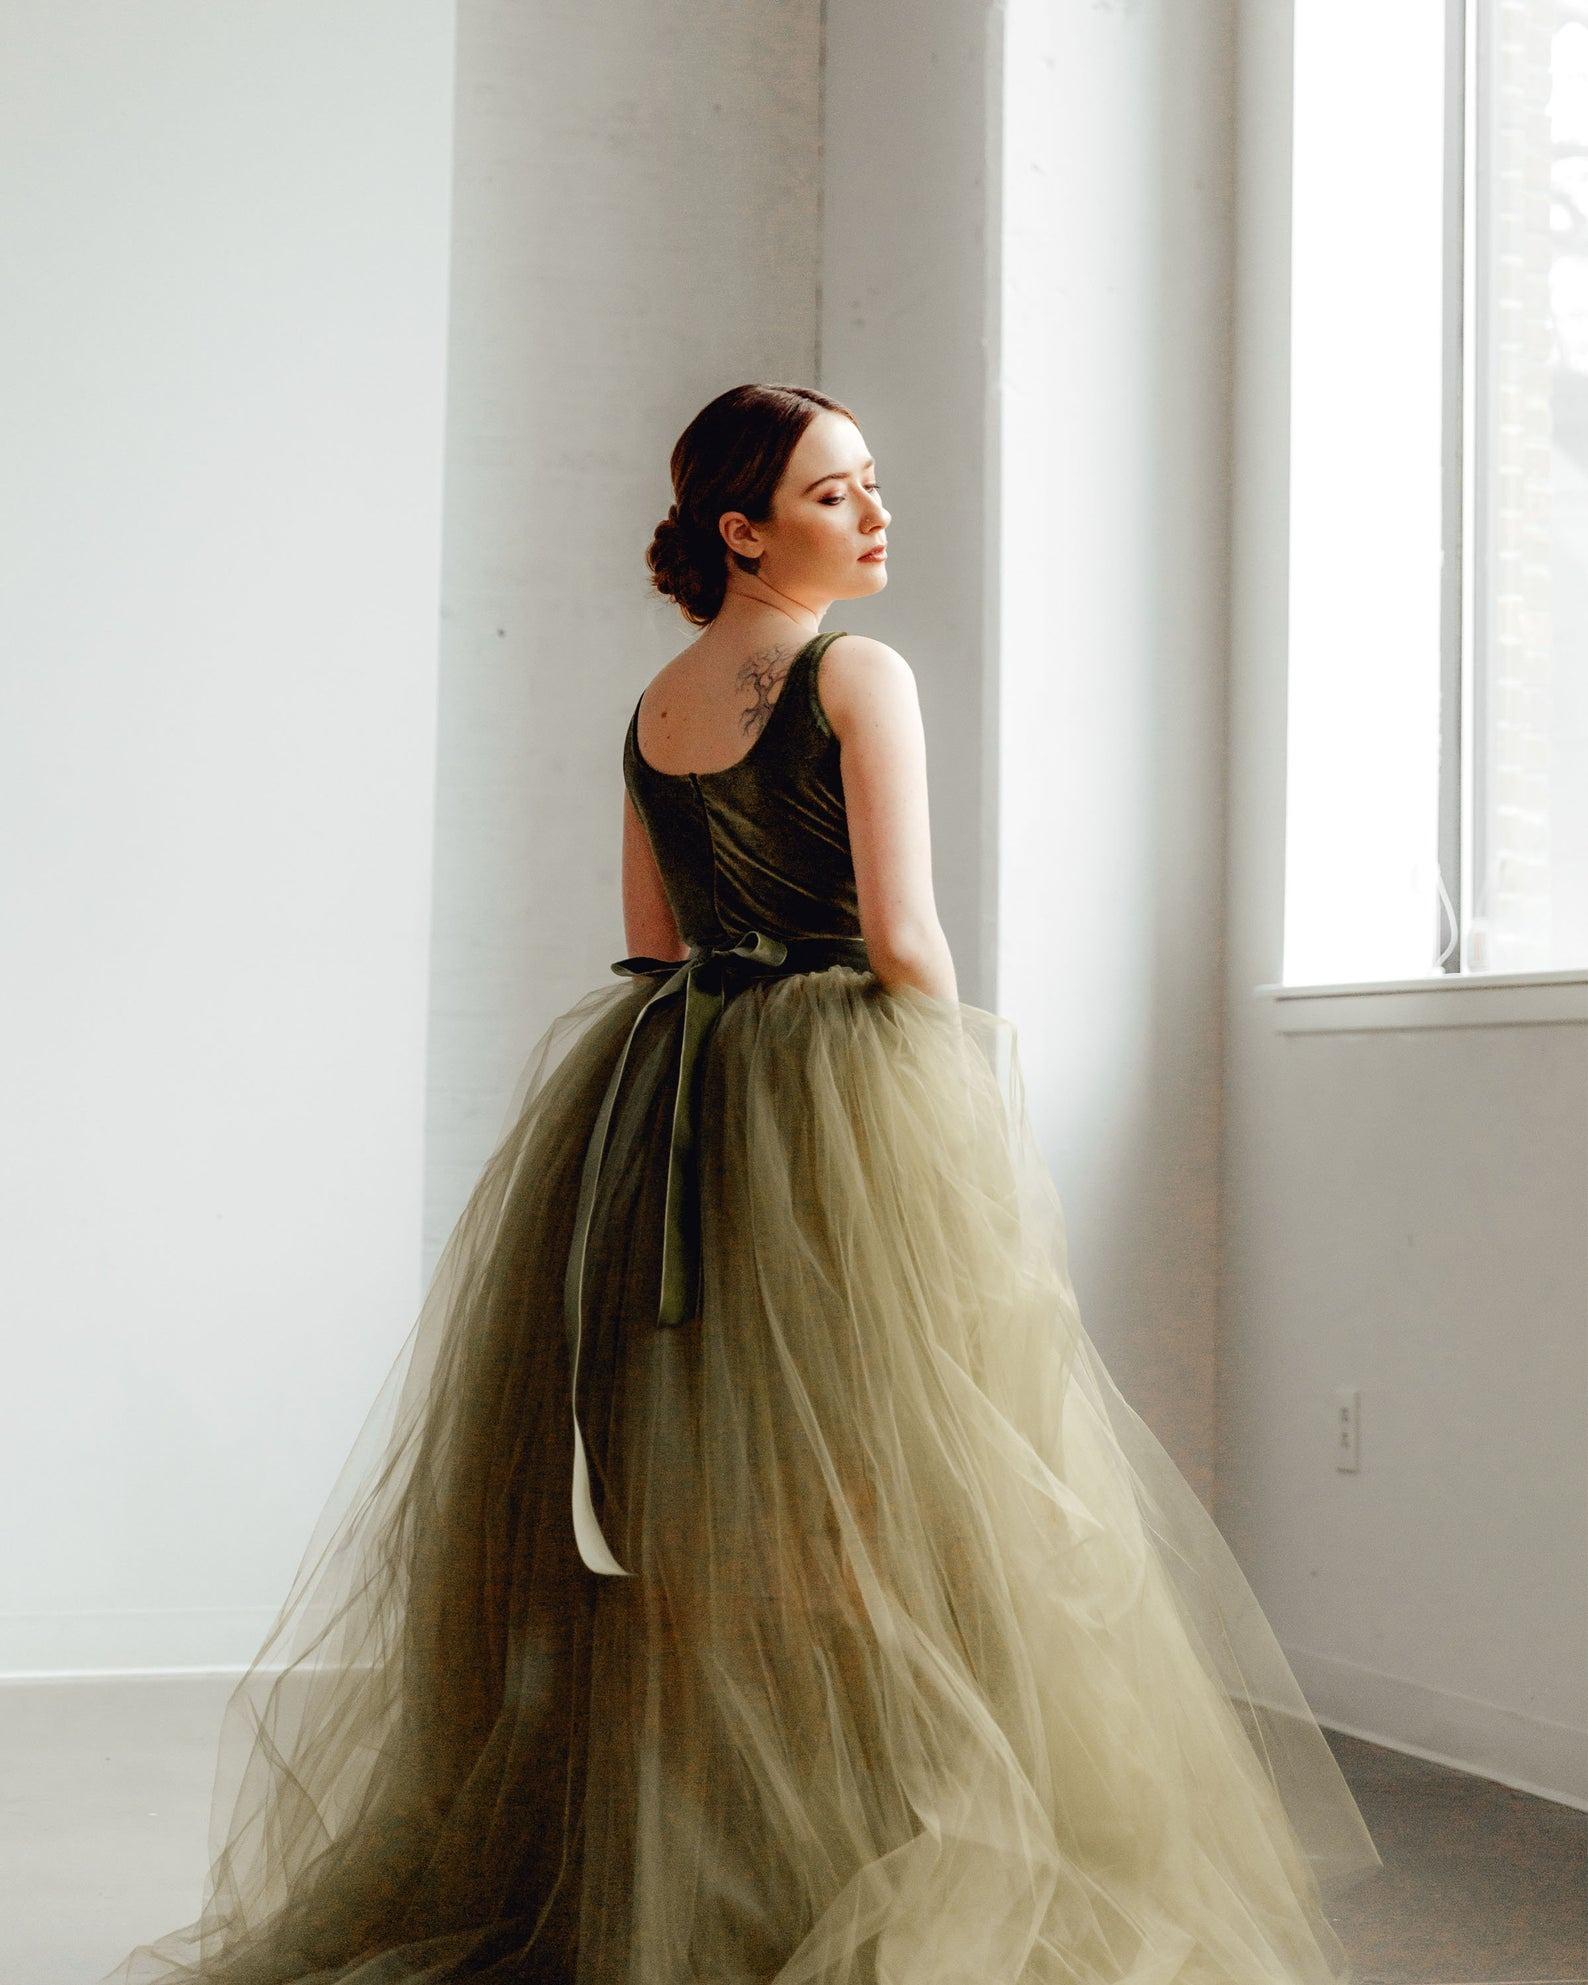 olive green tulle online wedding dress from Sweet Caroline Styles on Etsy